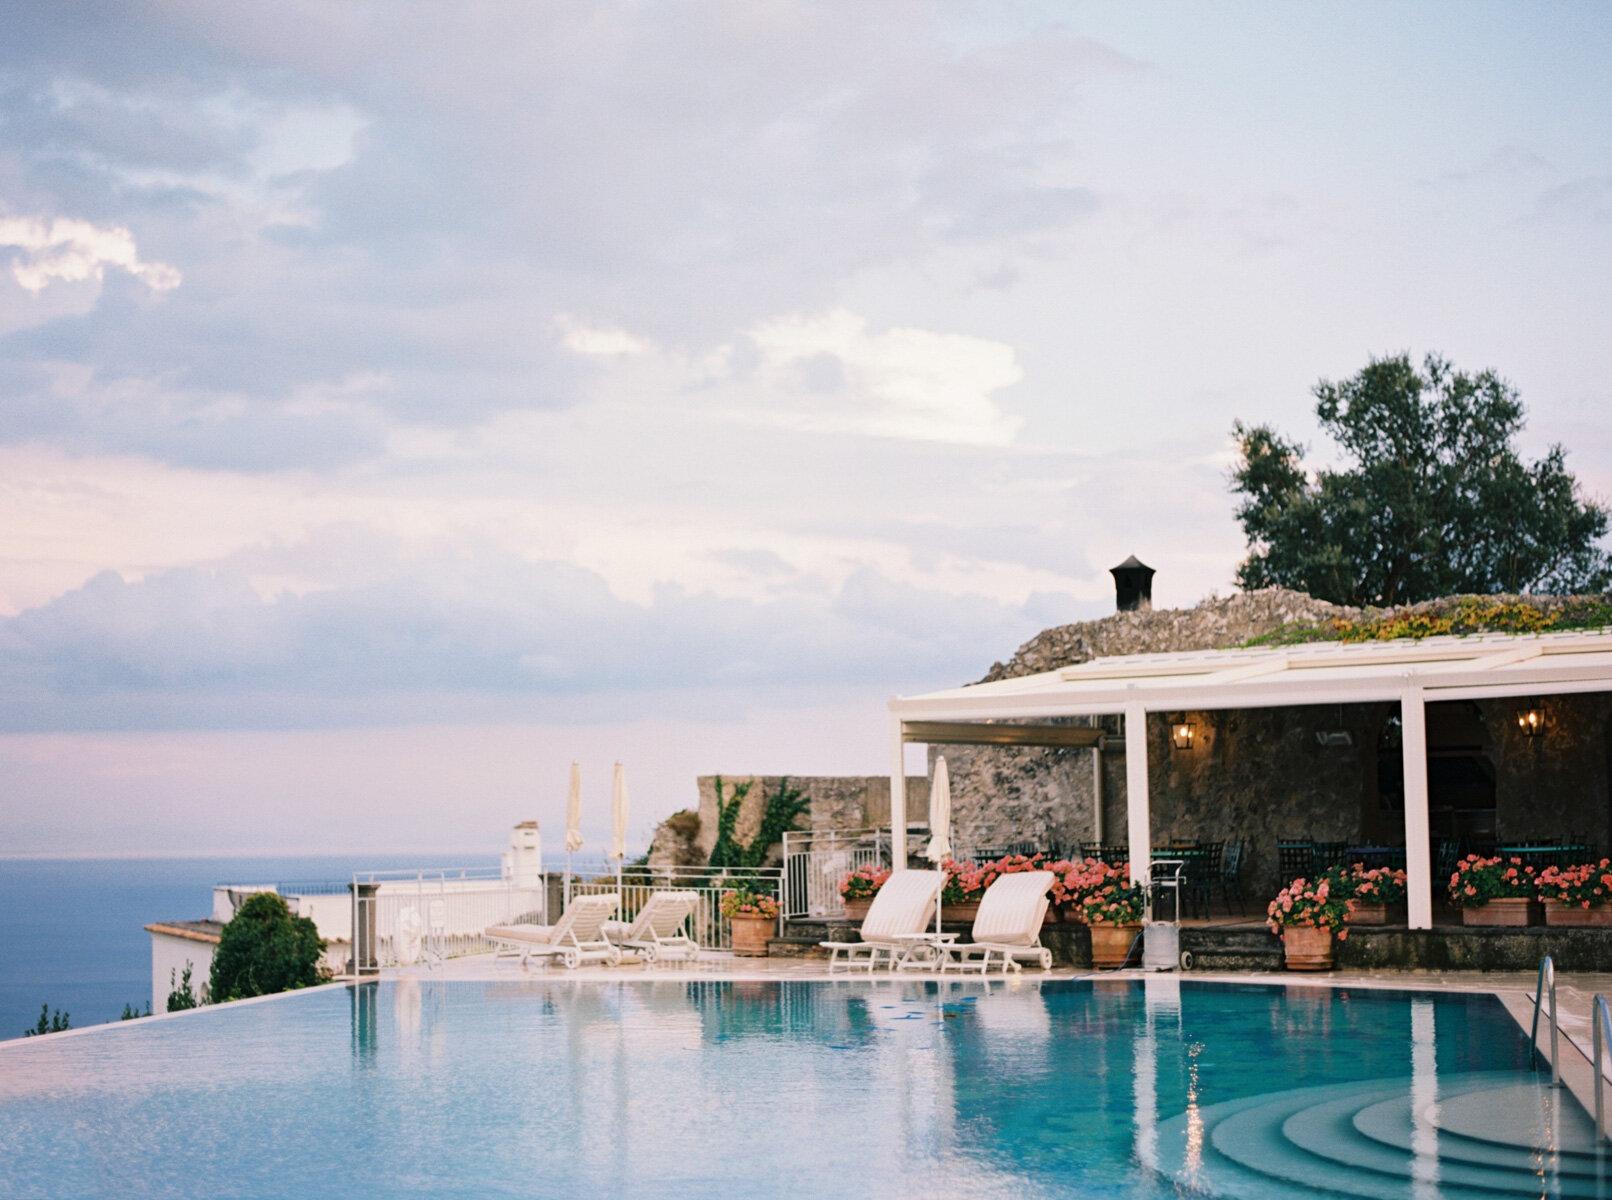 Belmond-Hotel-Caruso-ravello-elopement-Katie-Grant-destination-wedding (43 of 50).jpg